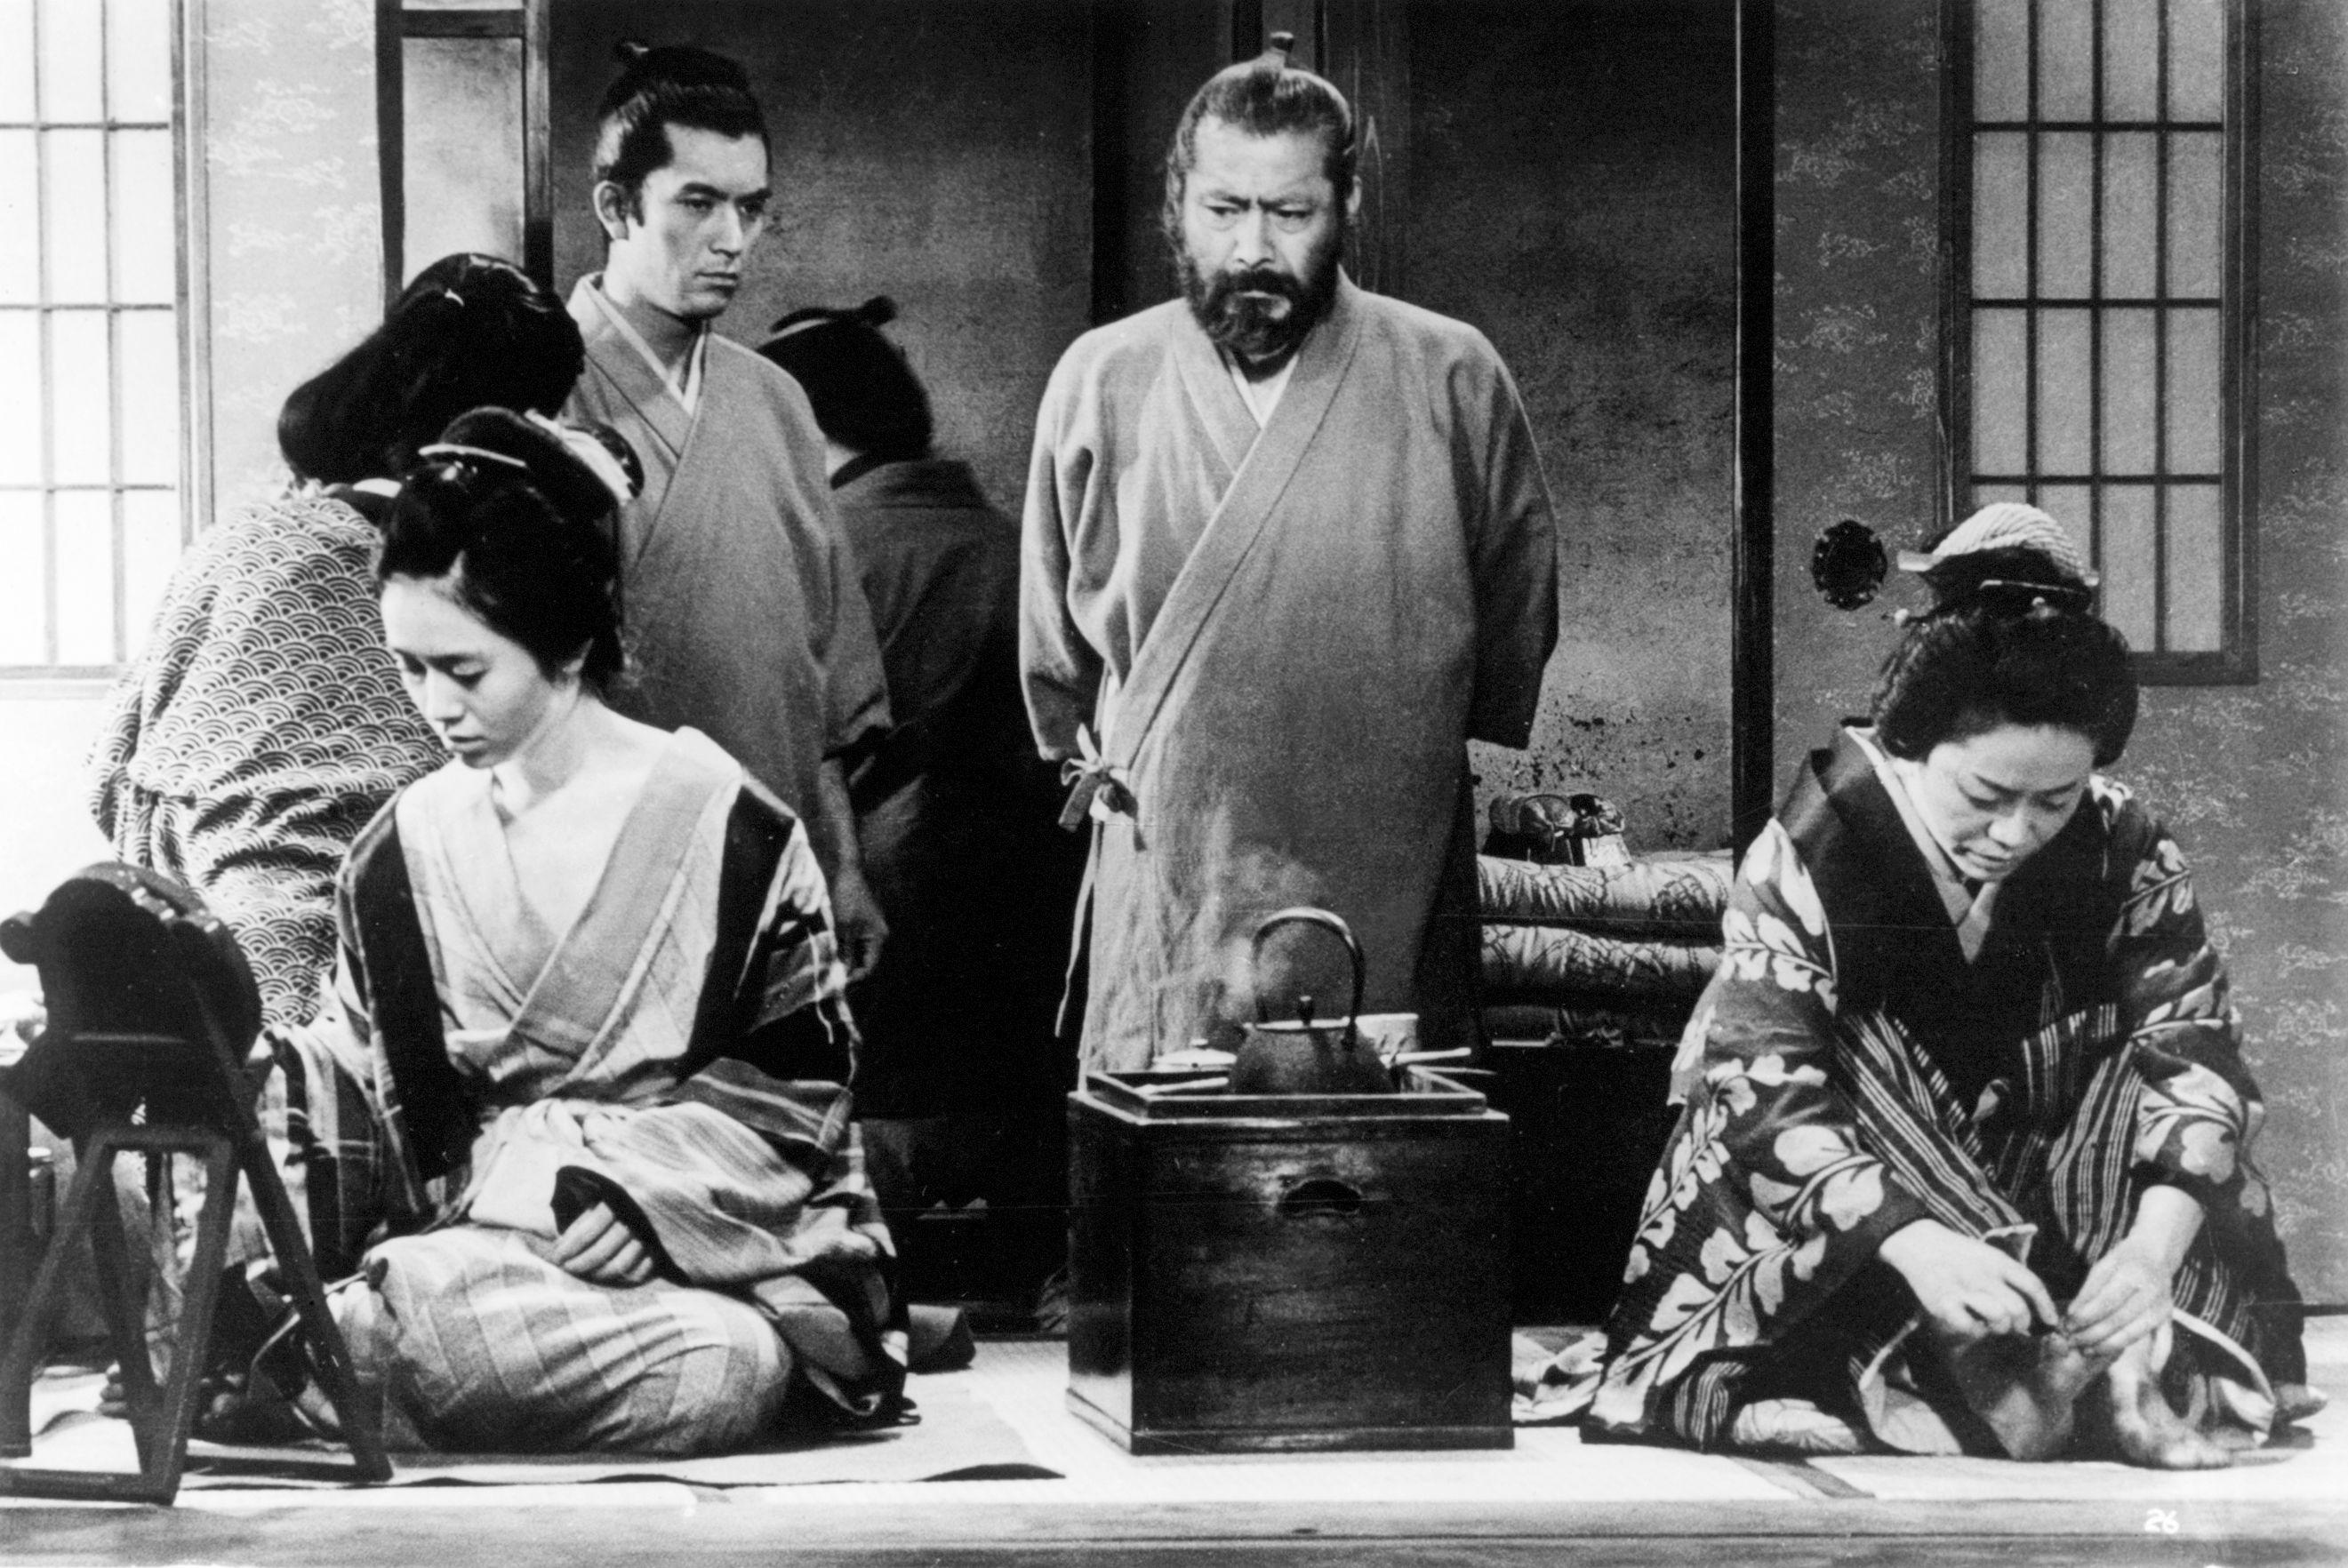 Toshirô Mifune, Yûzô Kayama, and Haruko Sugimura in Akahige (1965)